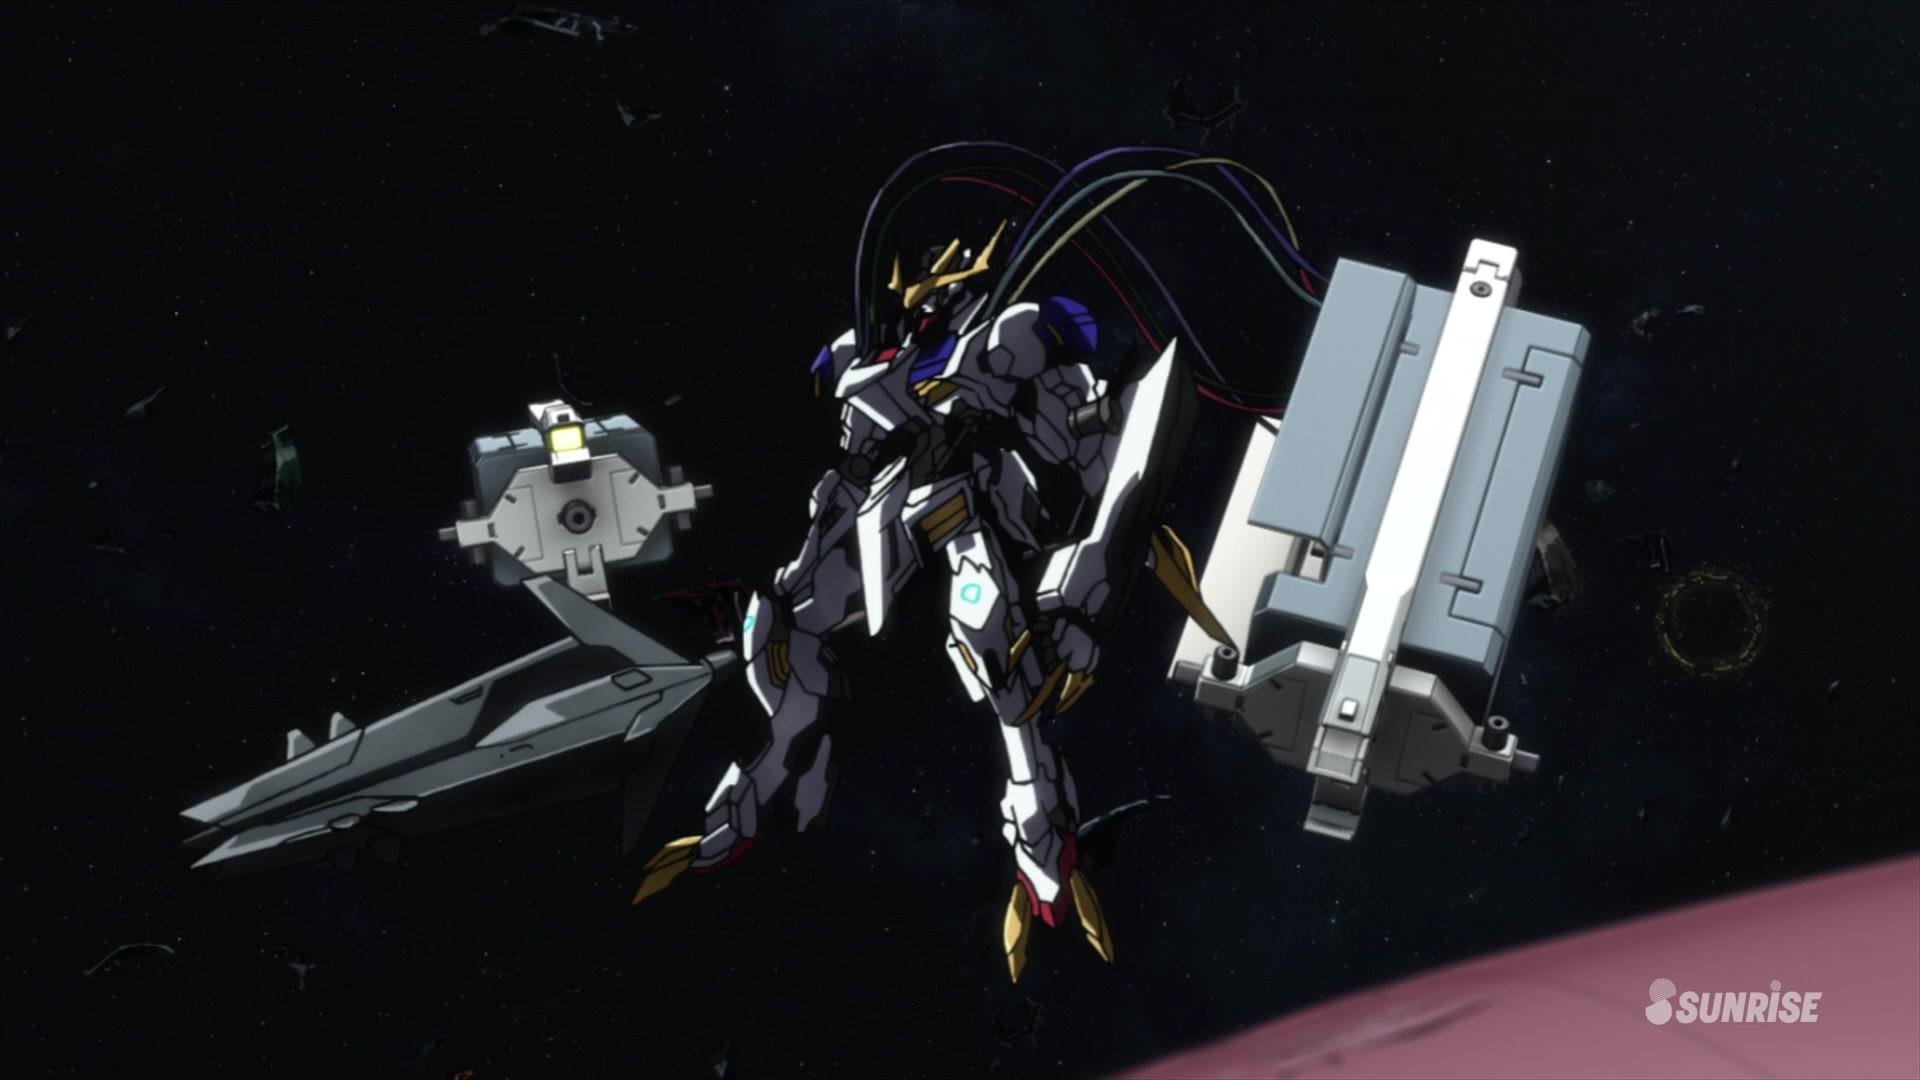 ASW-G-08 Gundam Barbatos Lupus Rex (Episode 45).jpg | The Gundam Wiki |  FANDOM powered by Wikia